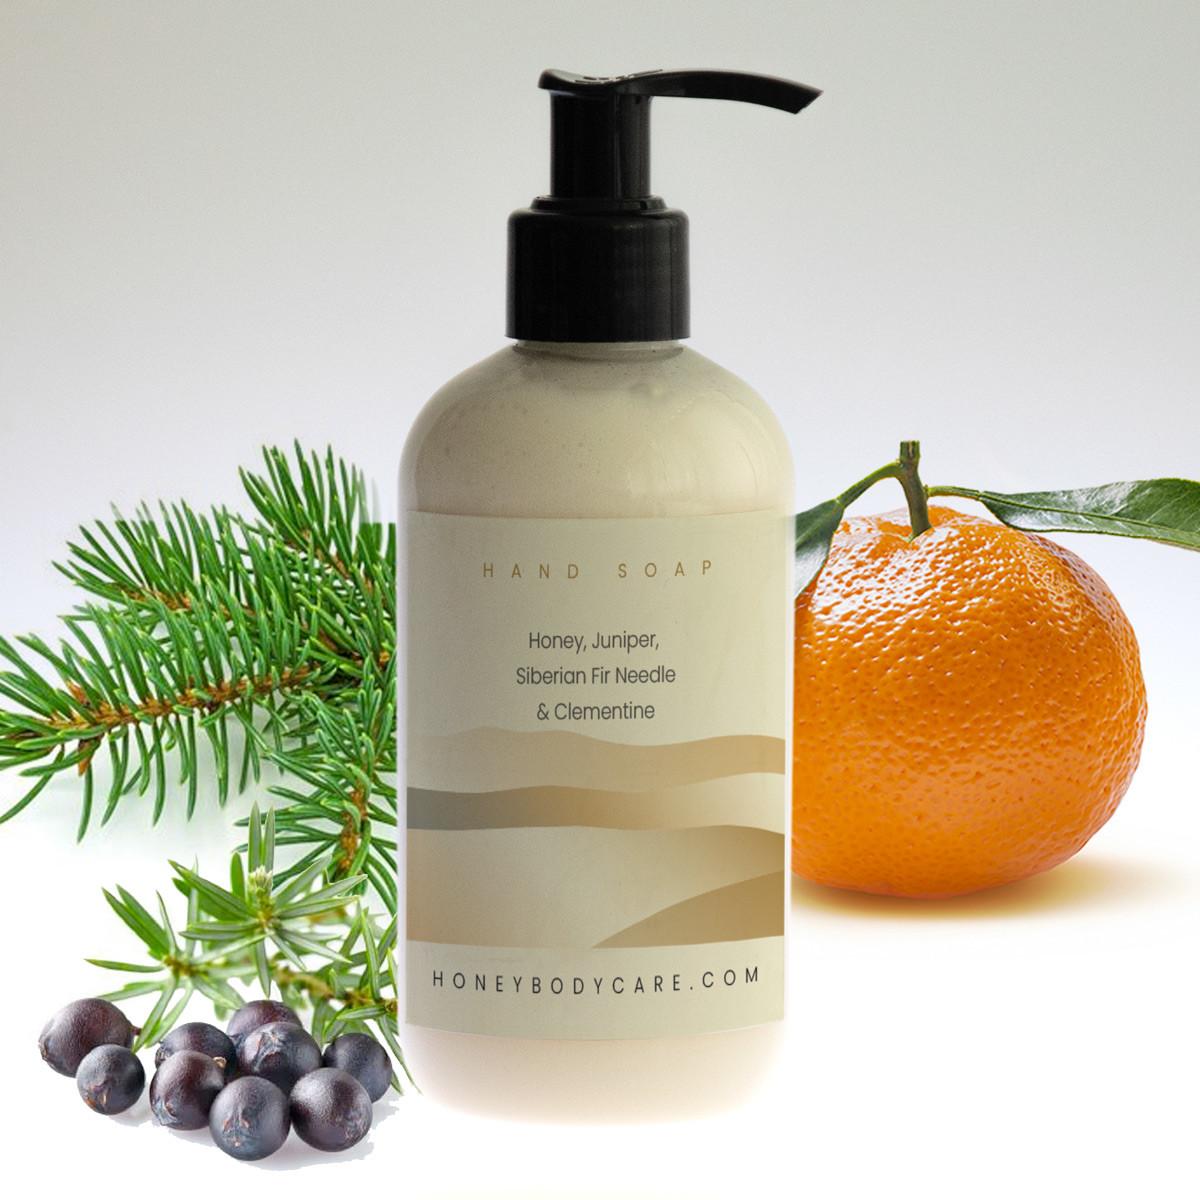 Hand wash Honey, Juniper, Siberian Fir Needle and Clementine